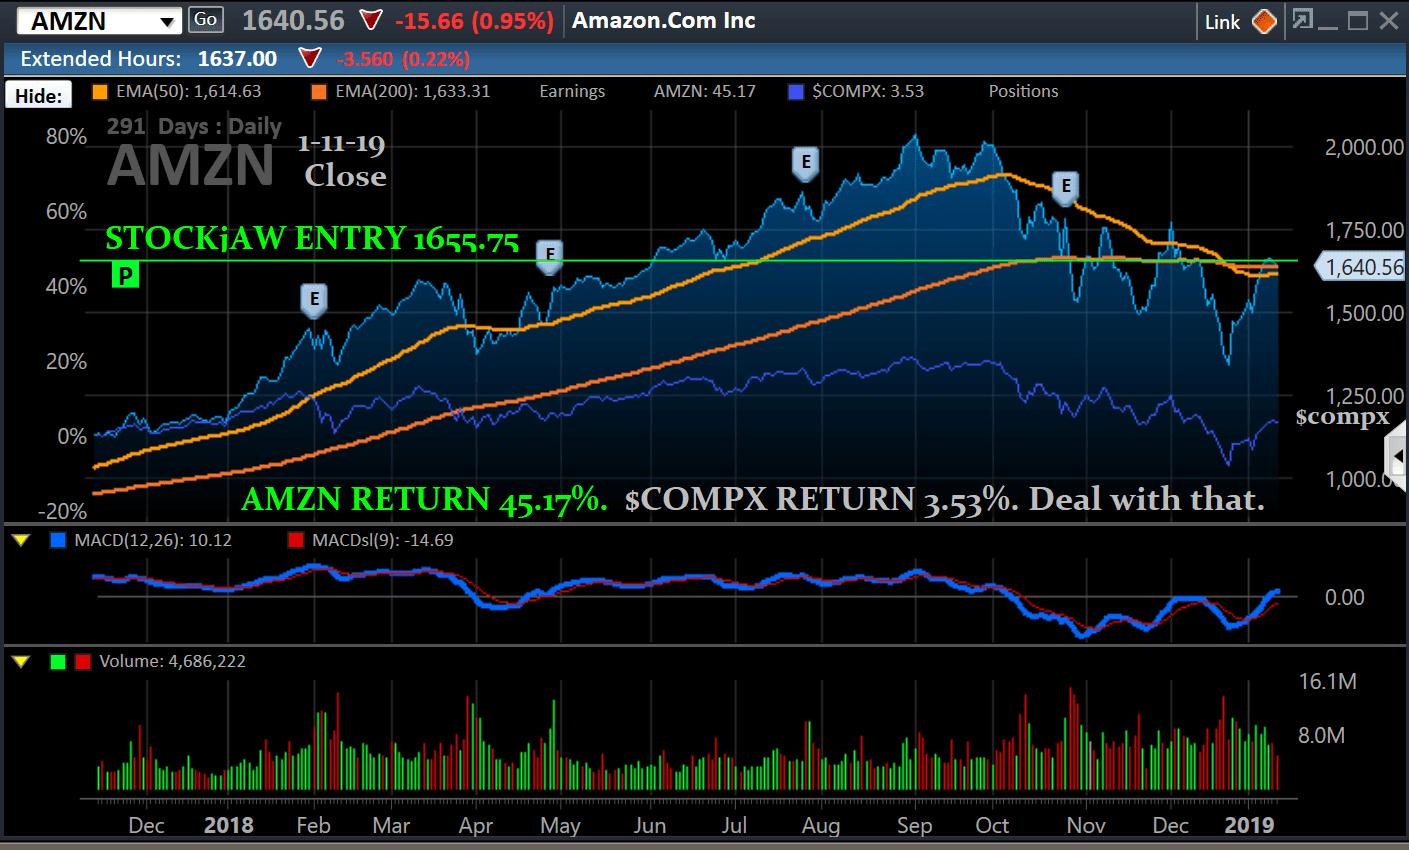 chart, amzn, ov-$compx, 1-11-19